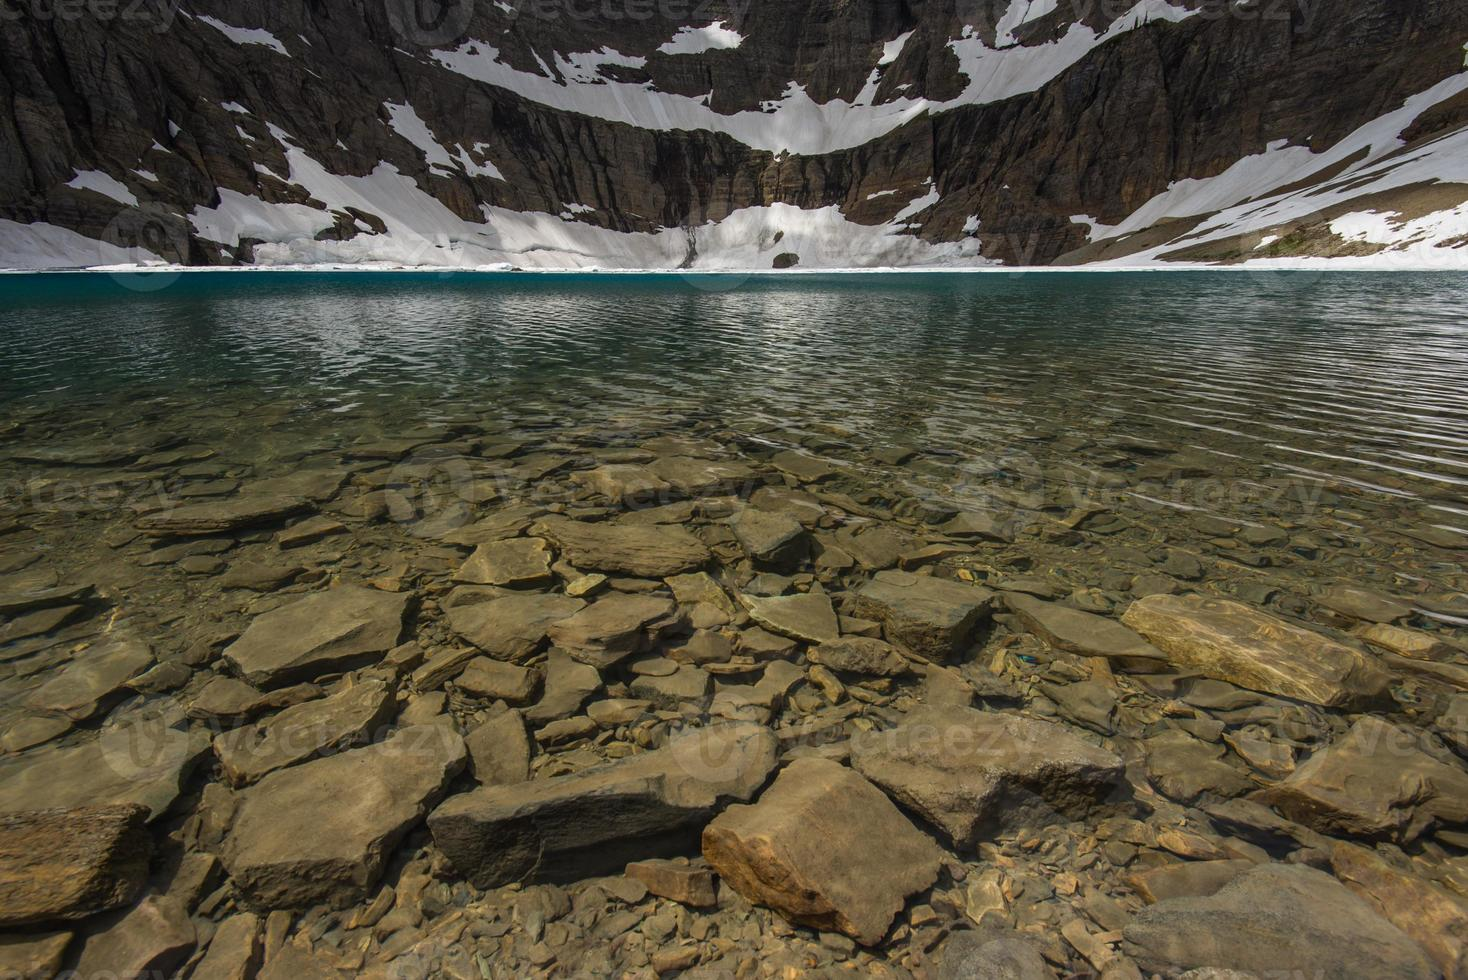 lago iceberg, foto